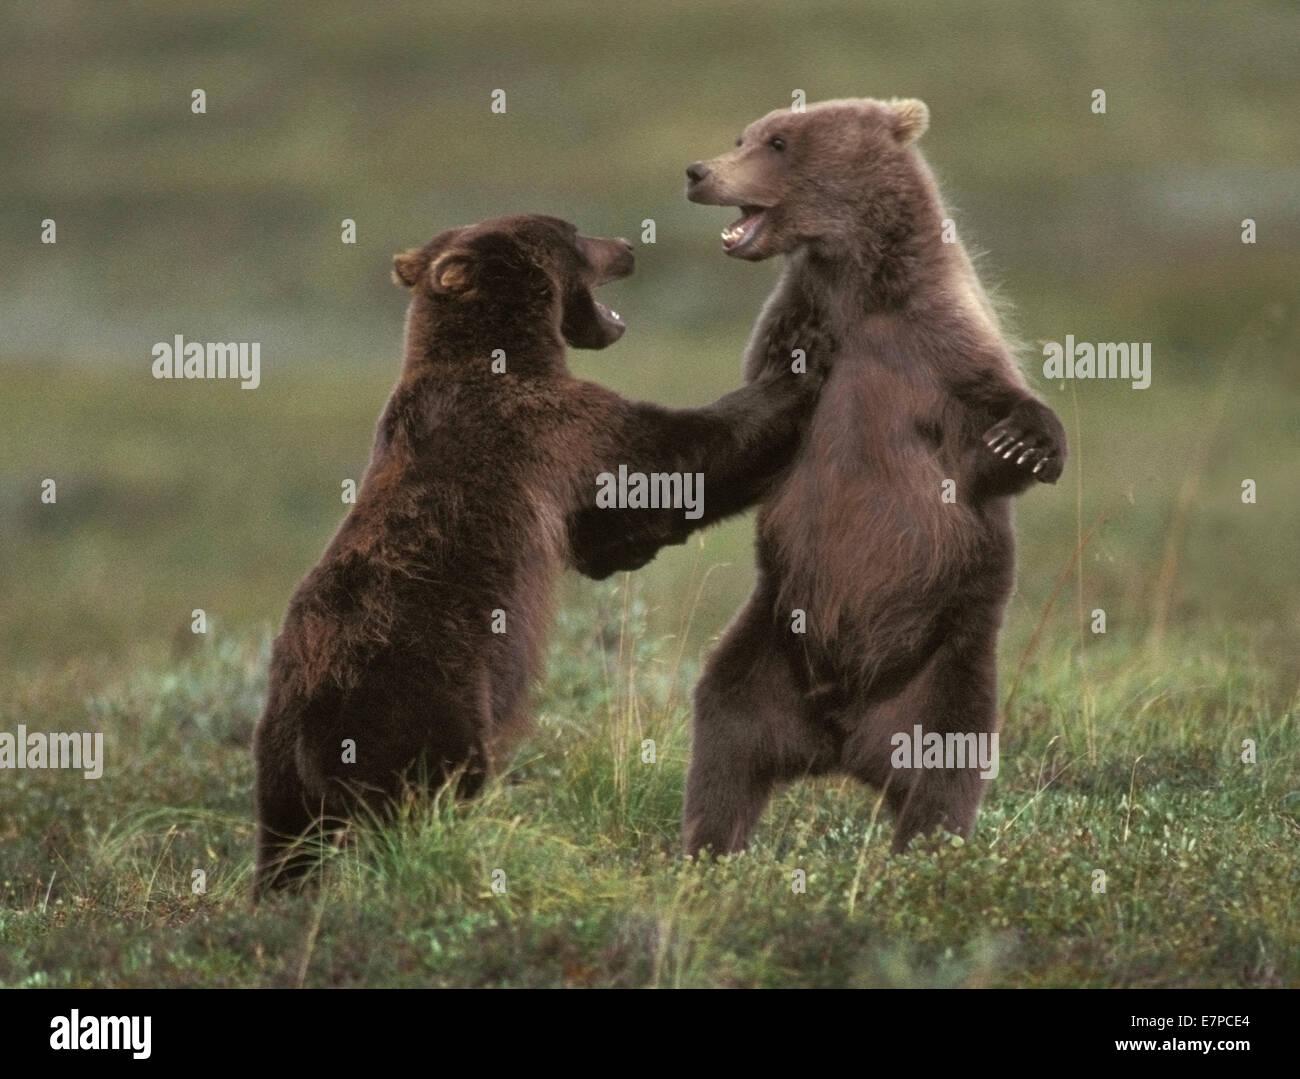 Grizzly Bear cubs at play in Denali National Park, Alaska. - Stock Image